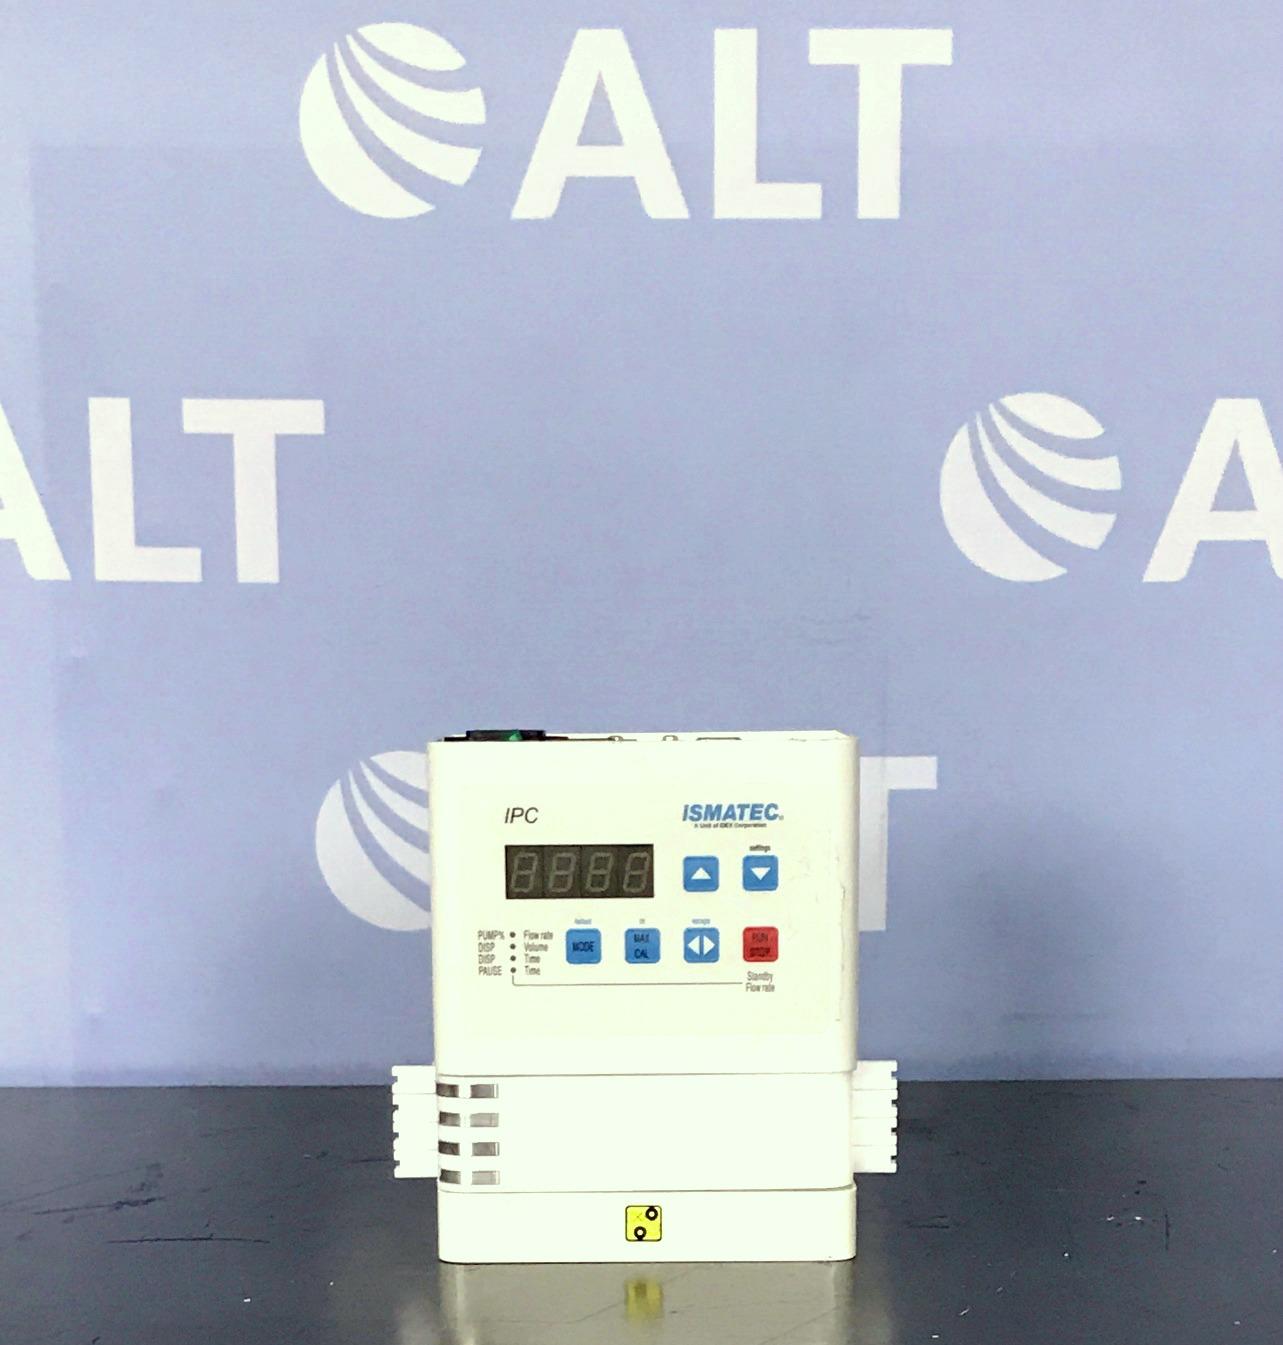 ISMATEC IPC High Precision Multichannel Dispenser 4-Channel ISM935C Image